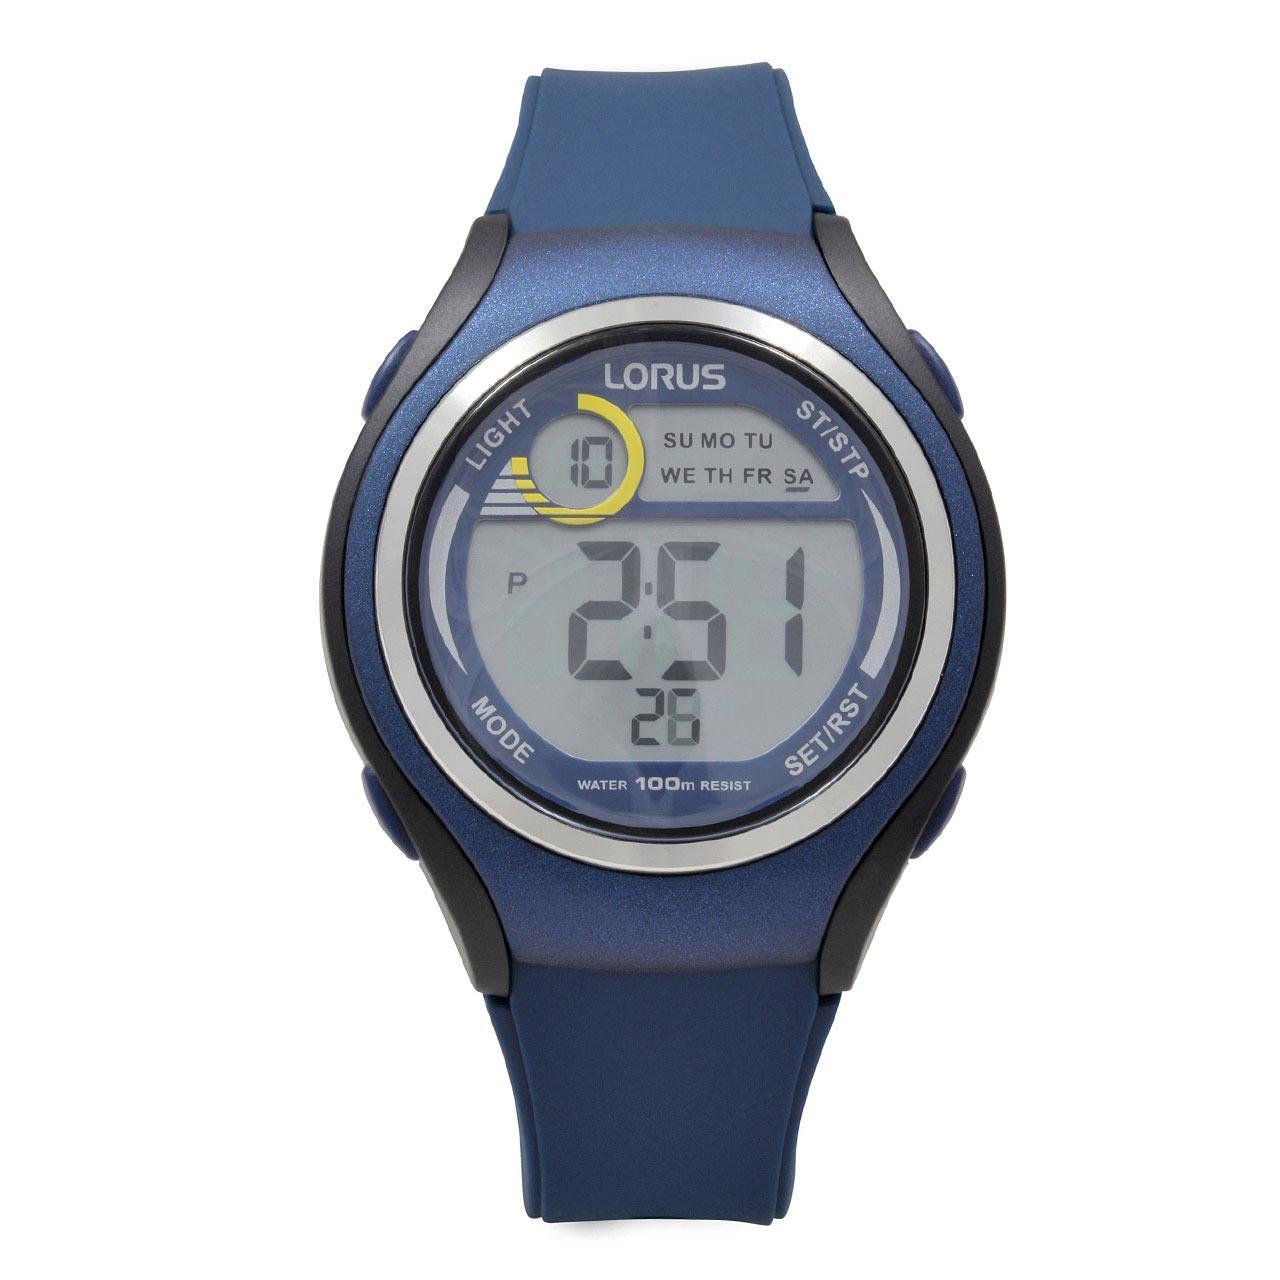 LORUS Jam Tangan - Blue Black - Silicon - R2375LX9